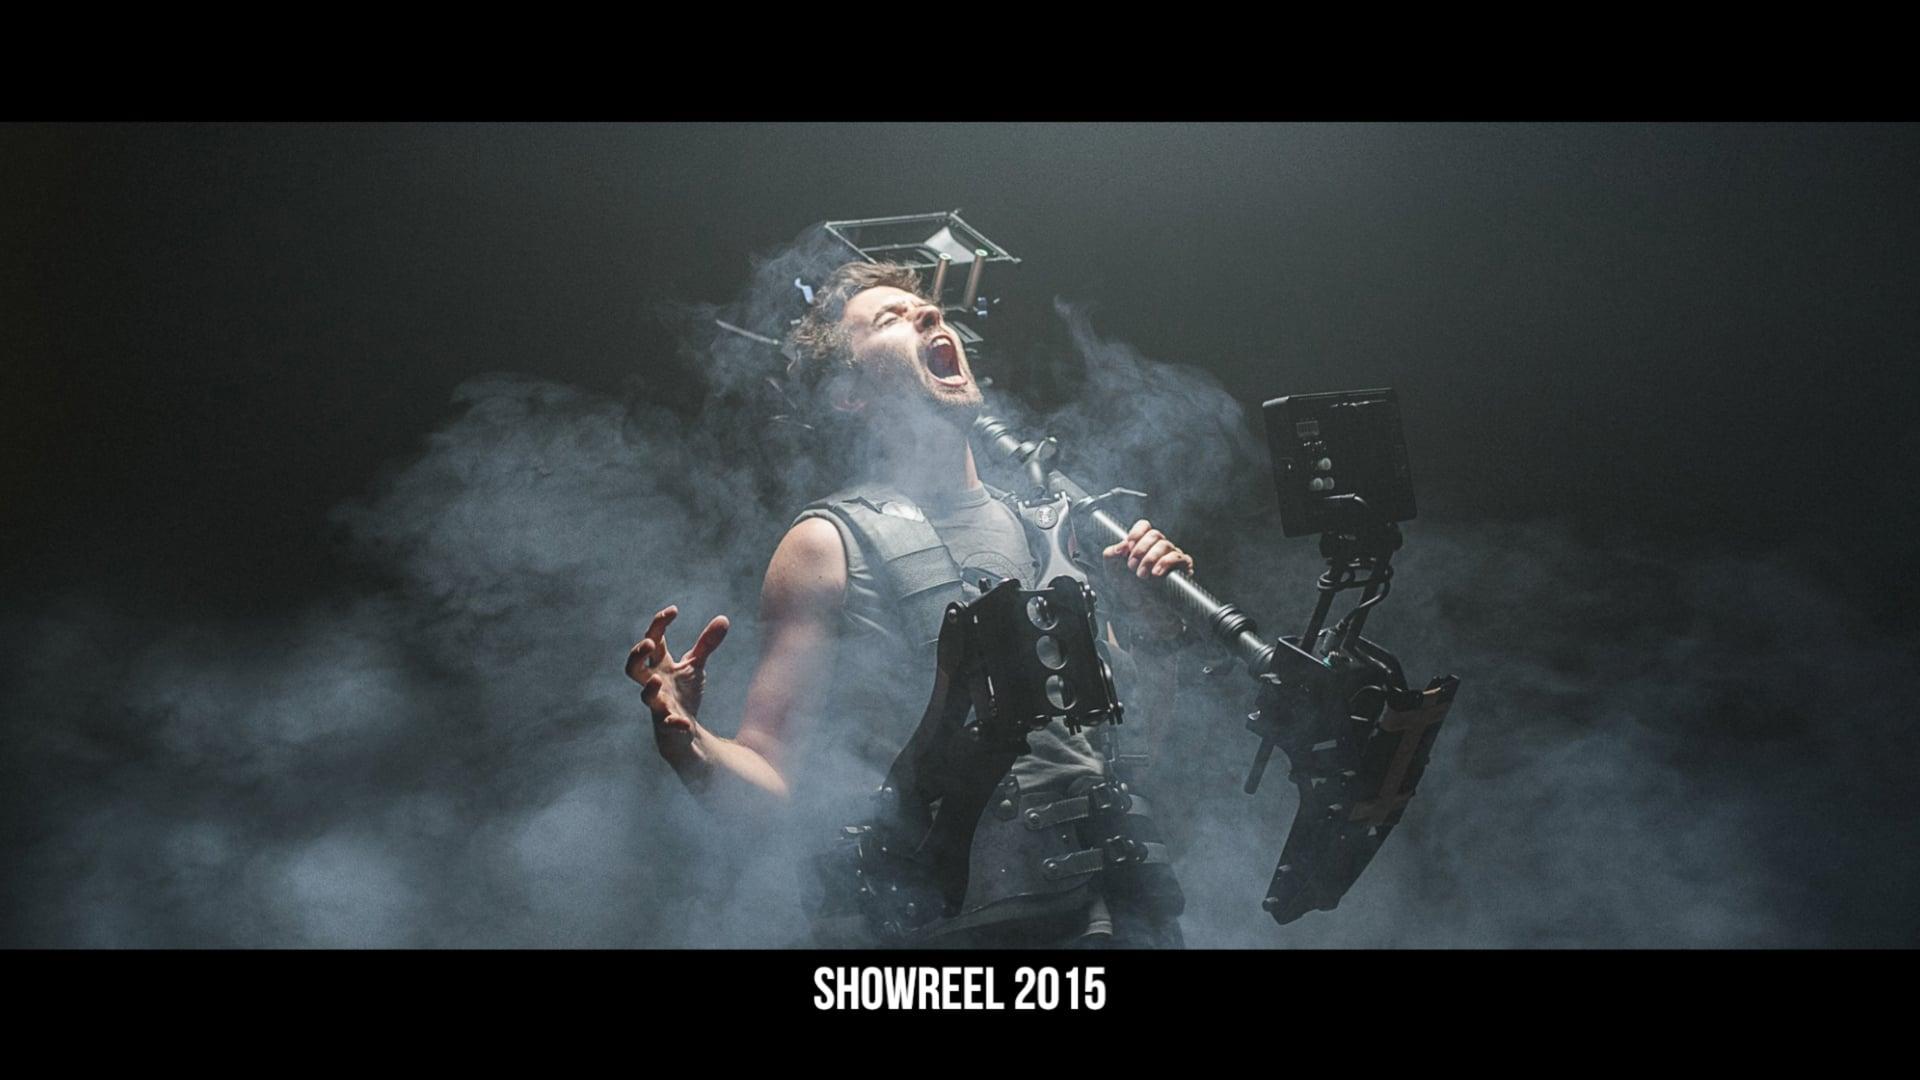 Jake Russell - Steadicam operator - Showreel 2015